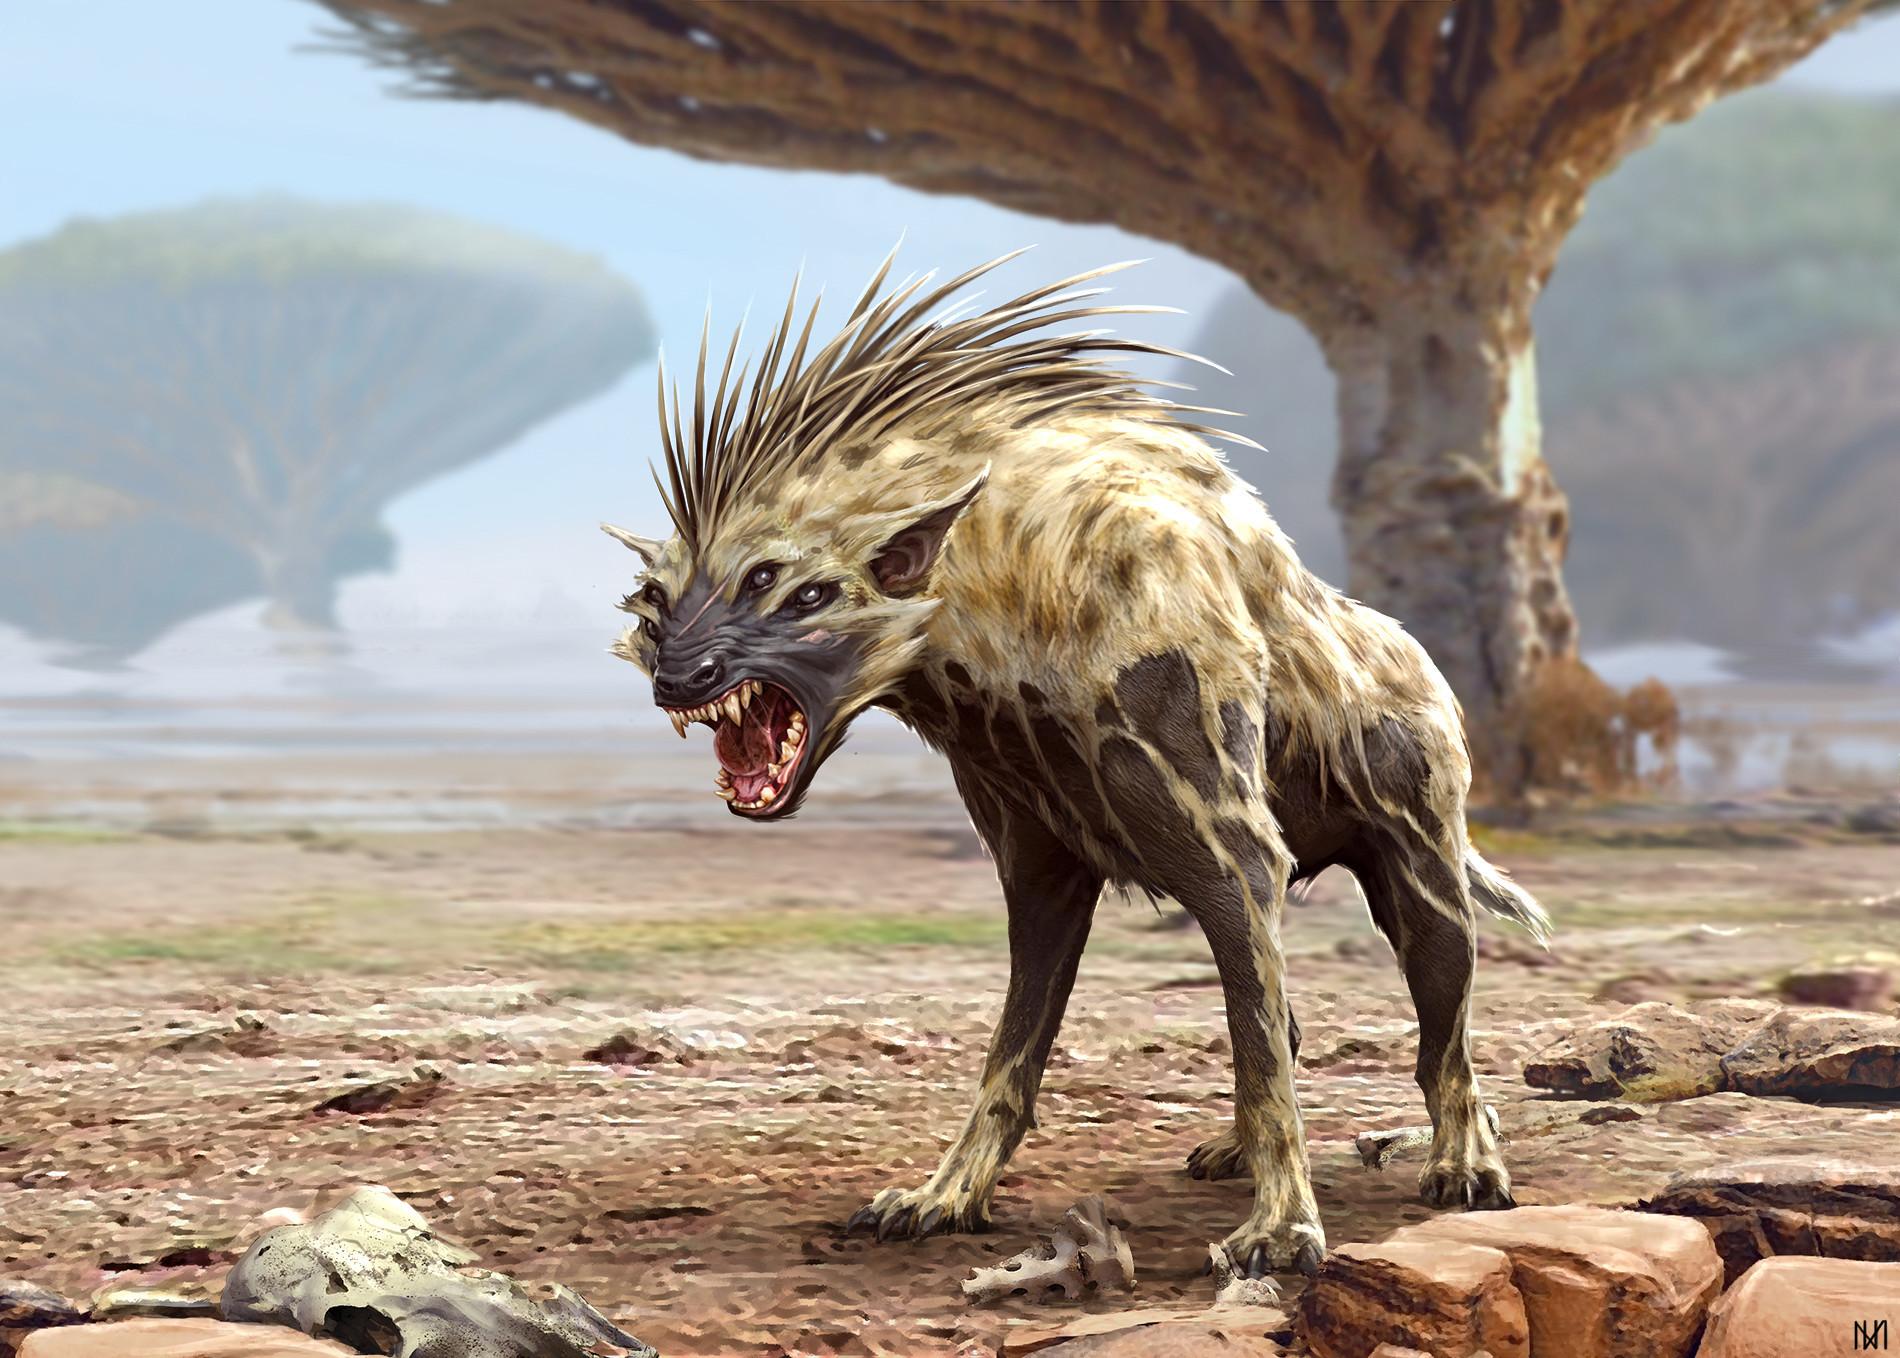 Nagy norbert evozon game studio the creature final version